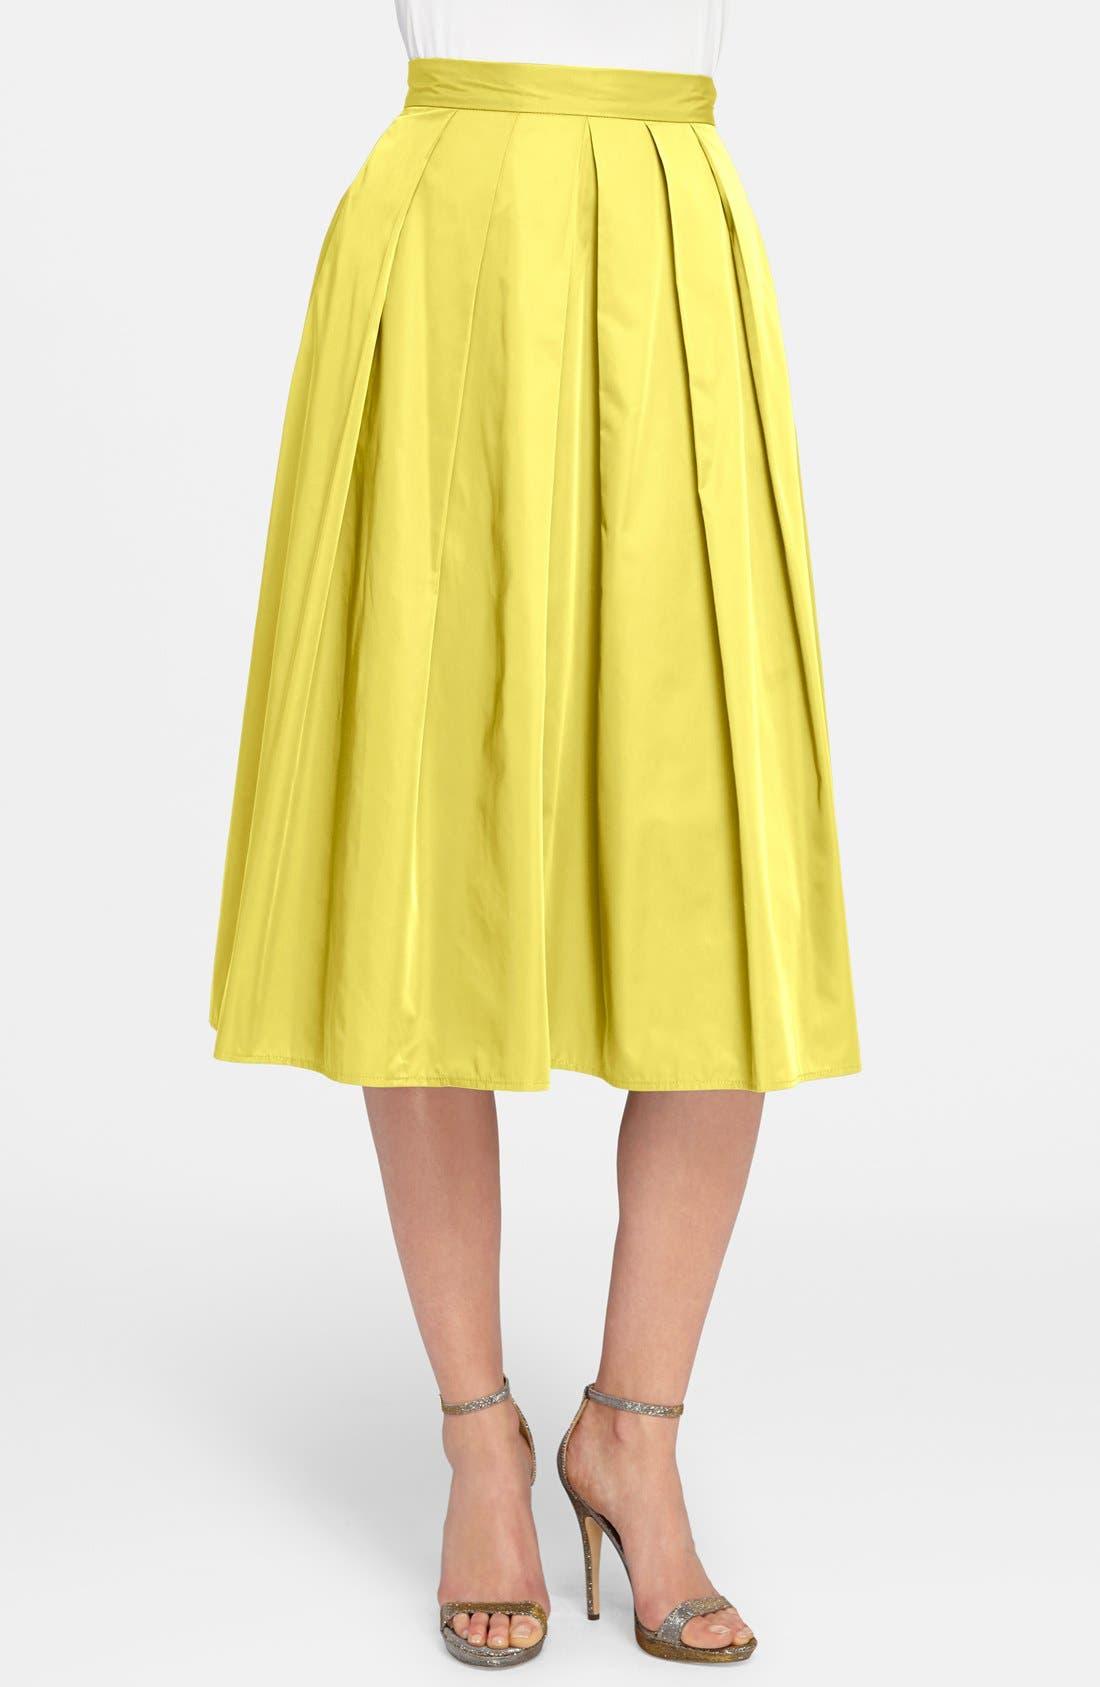 Alternate Image 1 Selected - Catherine Catherine Malandrino 'Ronnie' Pleat Midi Skirt